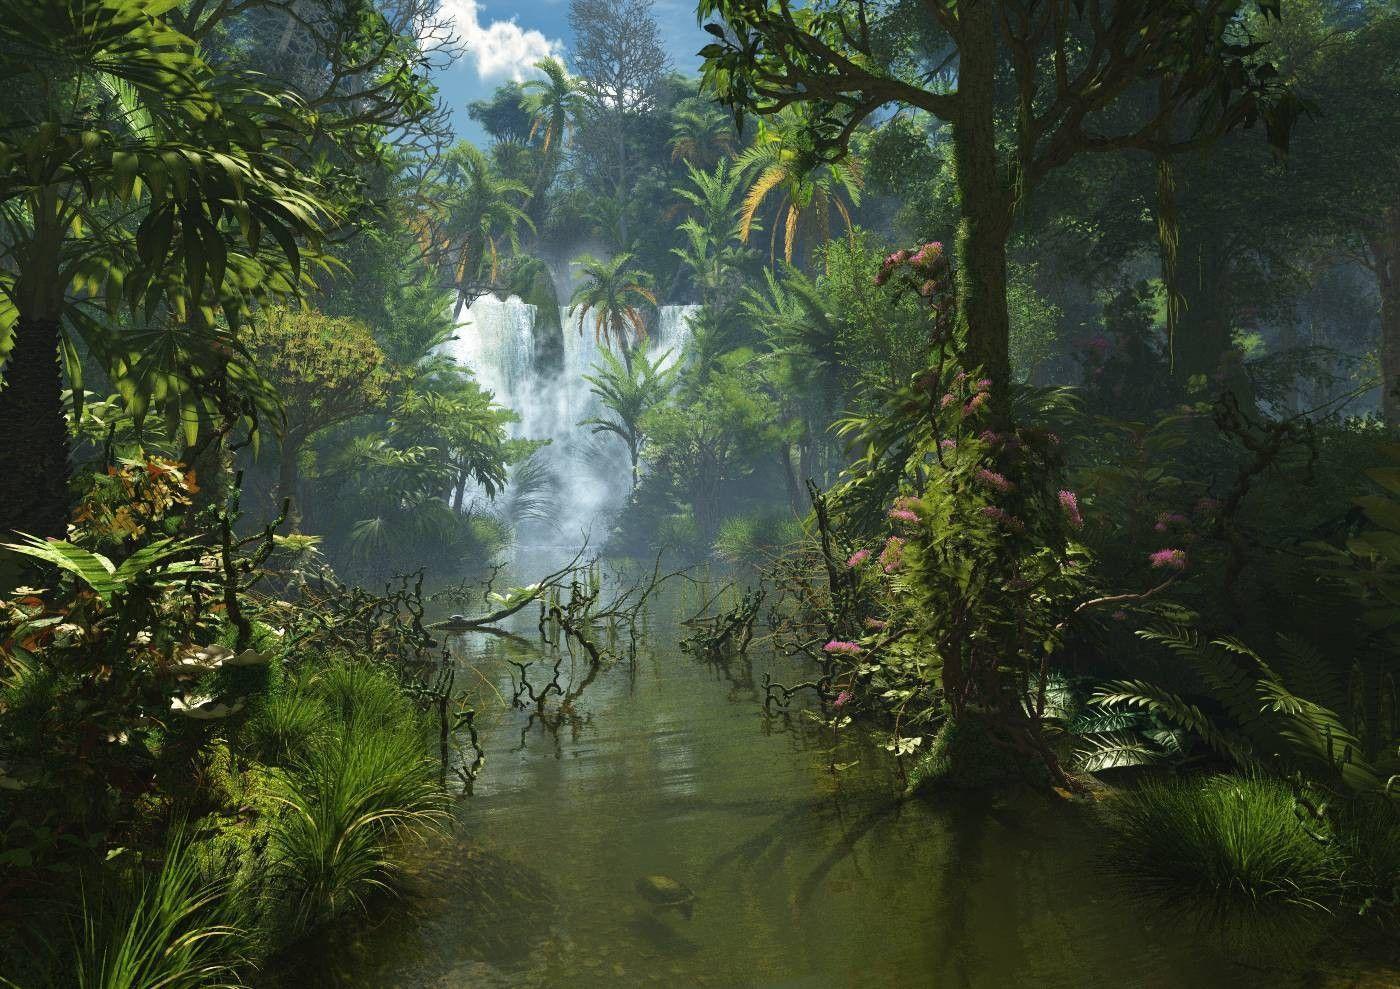 Jungle Waterfall Wallpaper Hd: Top Free Jungle Rain Backgrounds